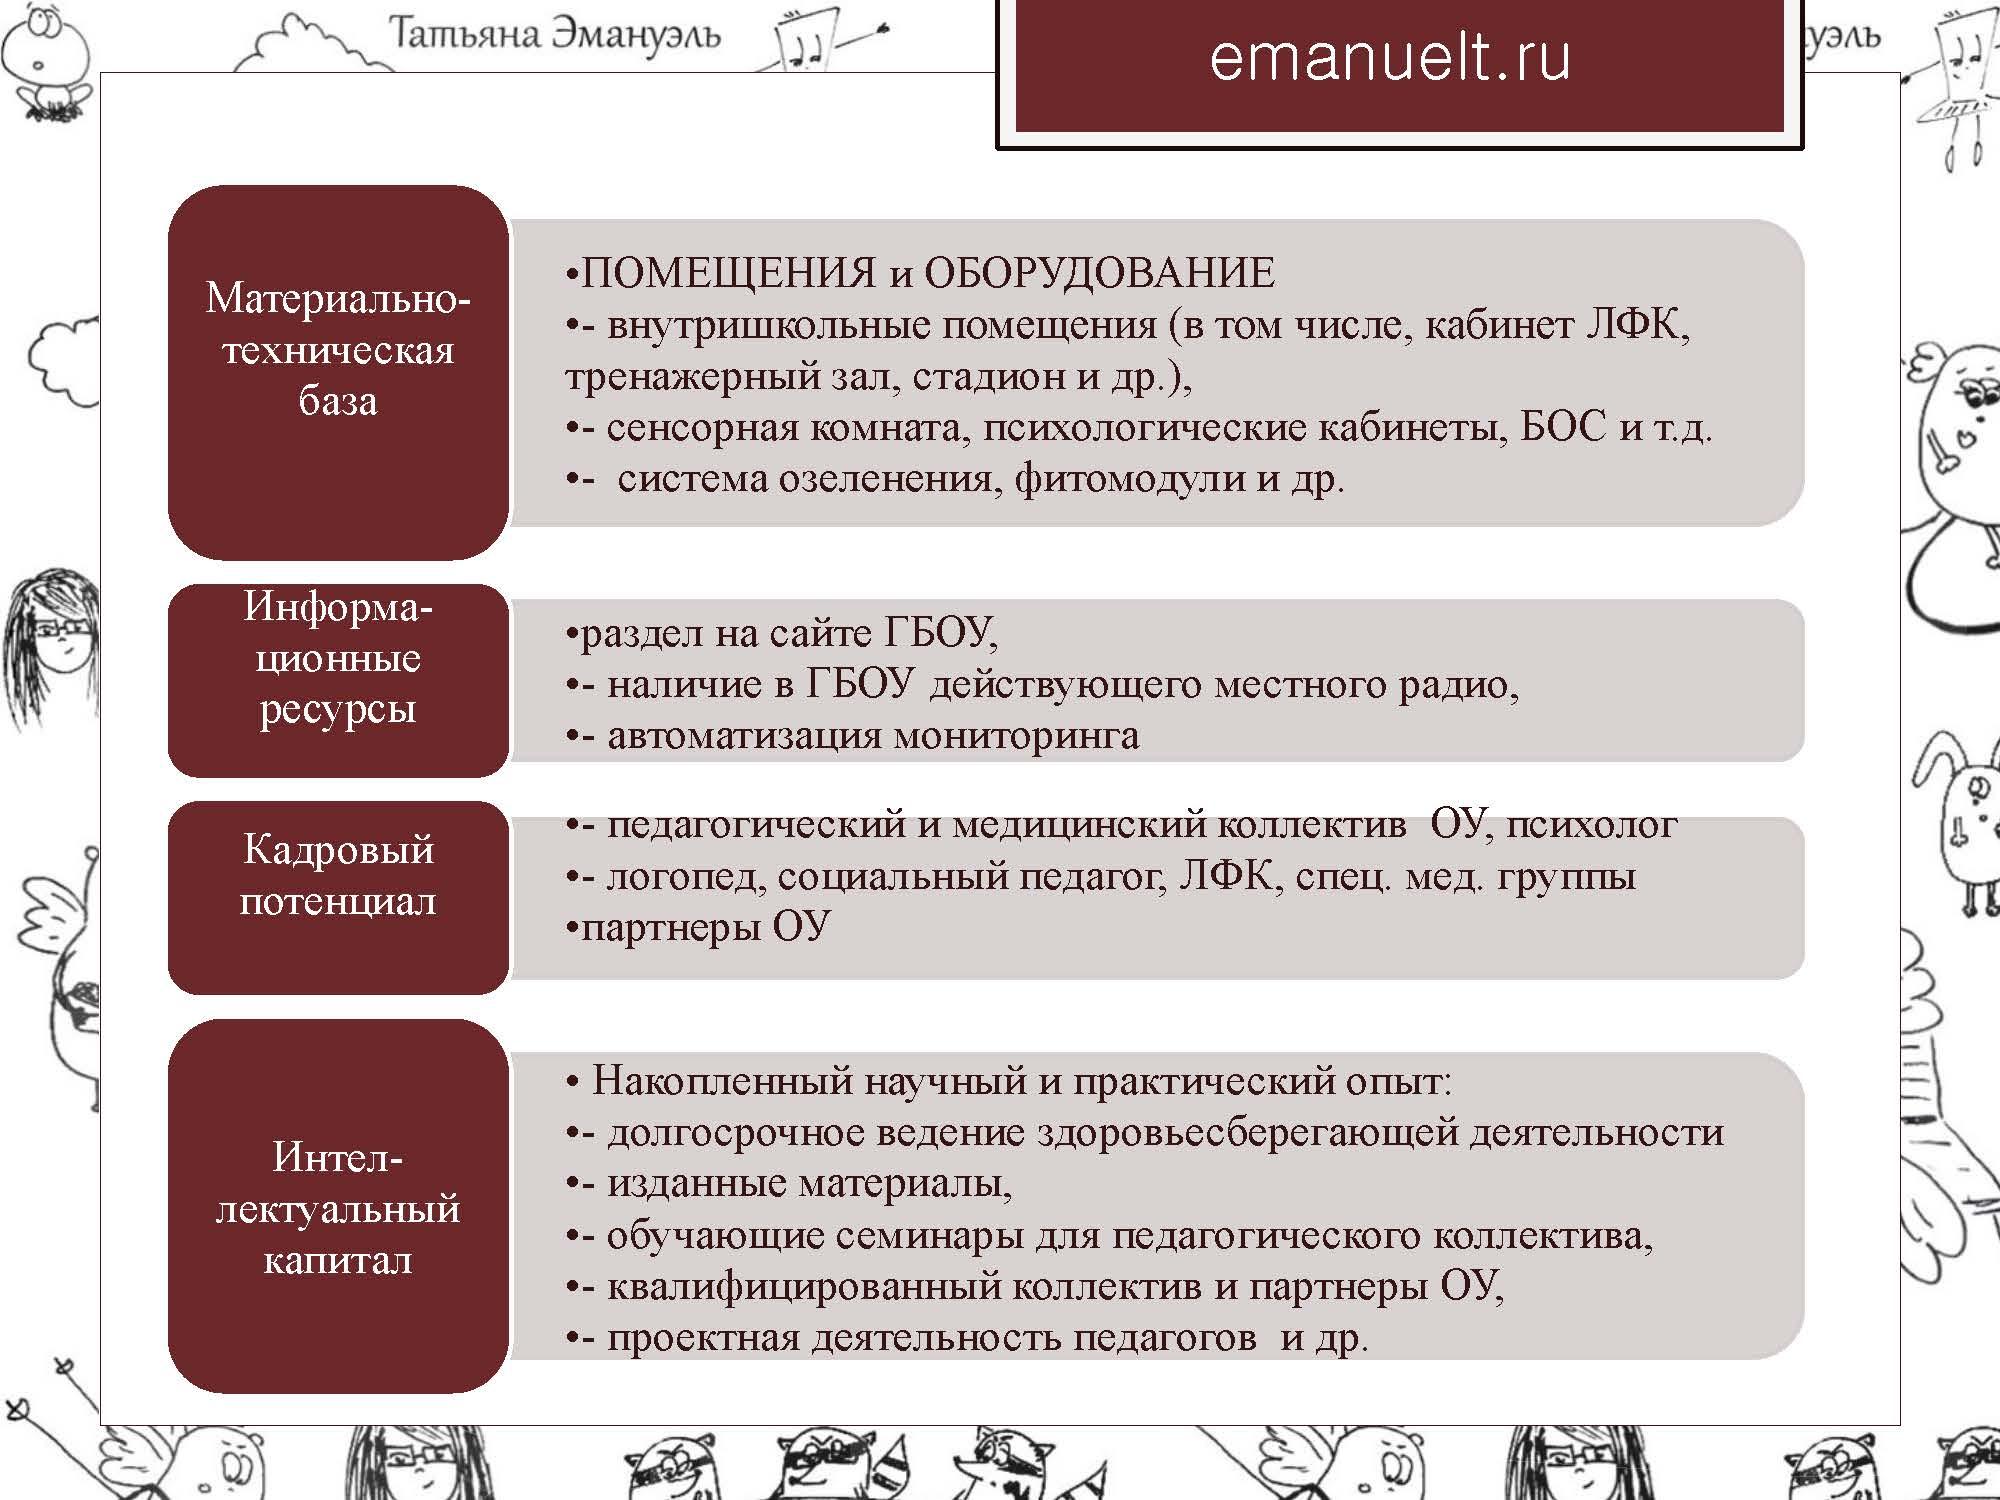 06 февраля эмануэль_Страница_034